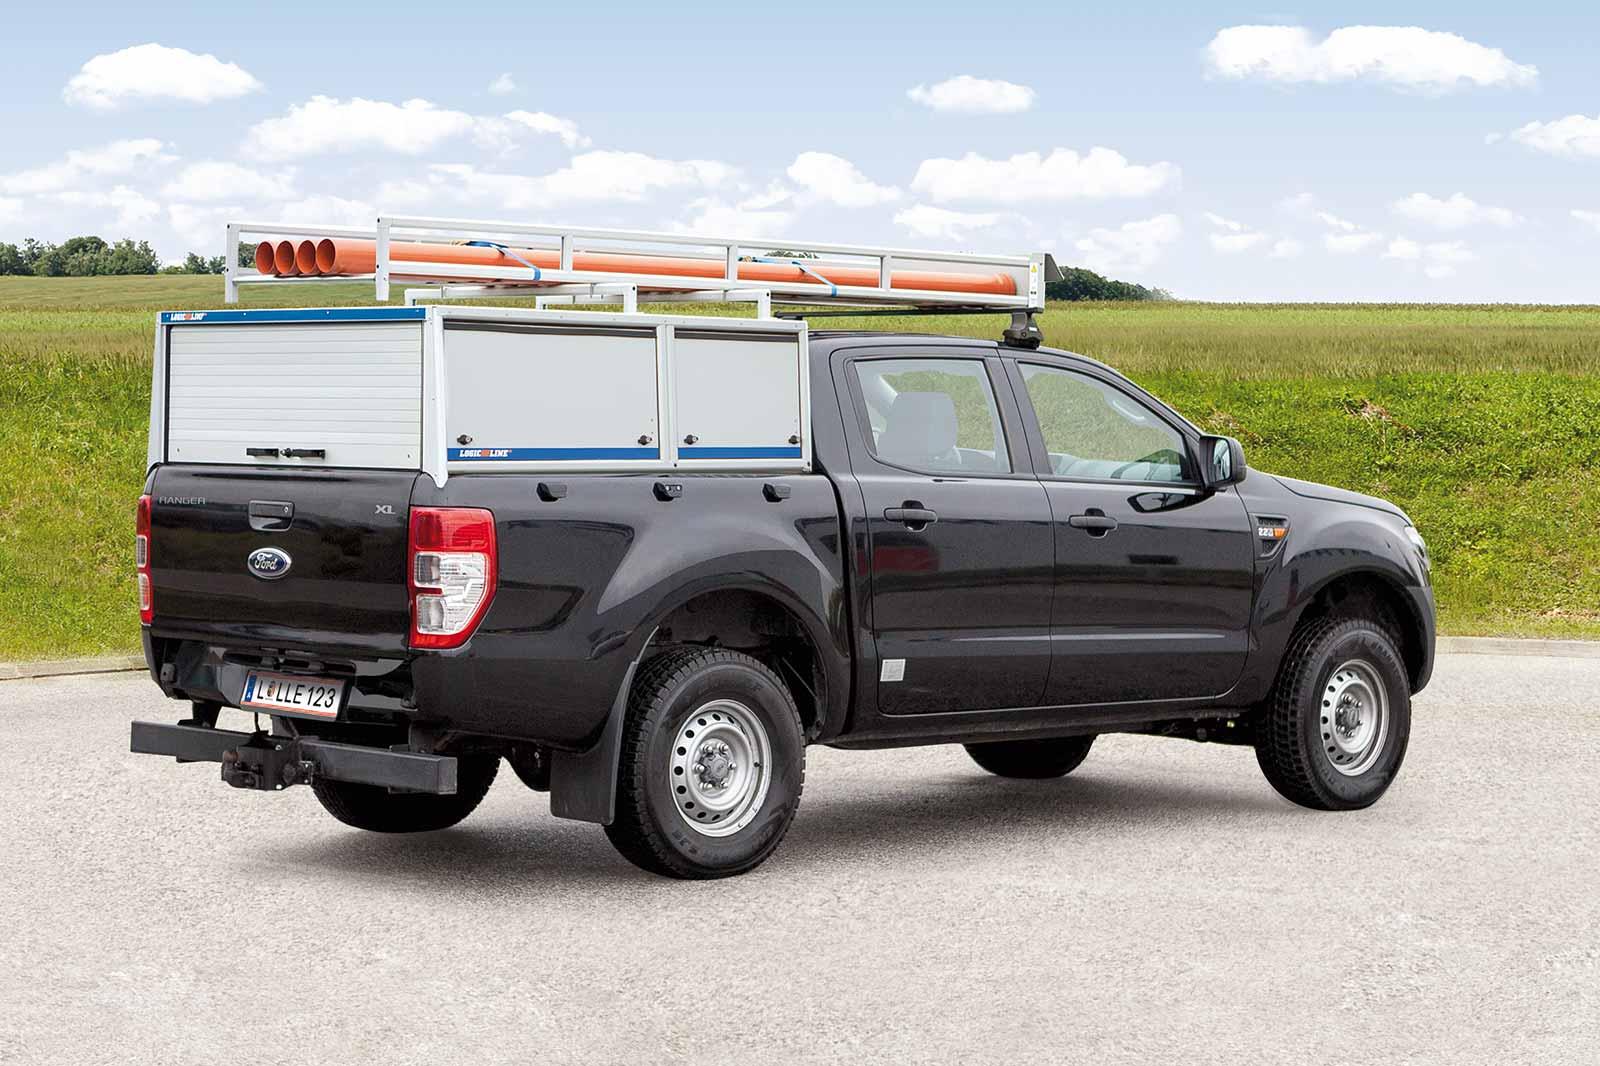 Ford Ranger mit PickUp System und PickUp Rack